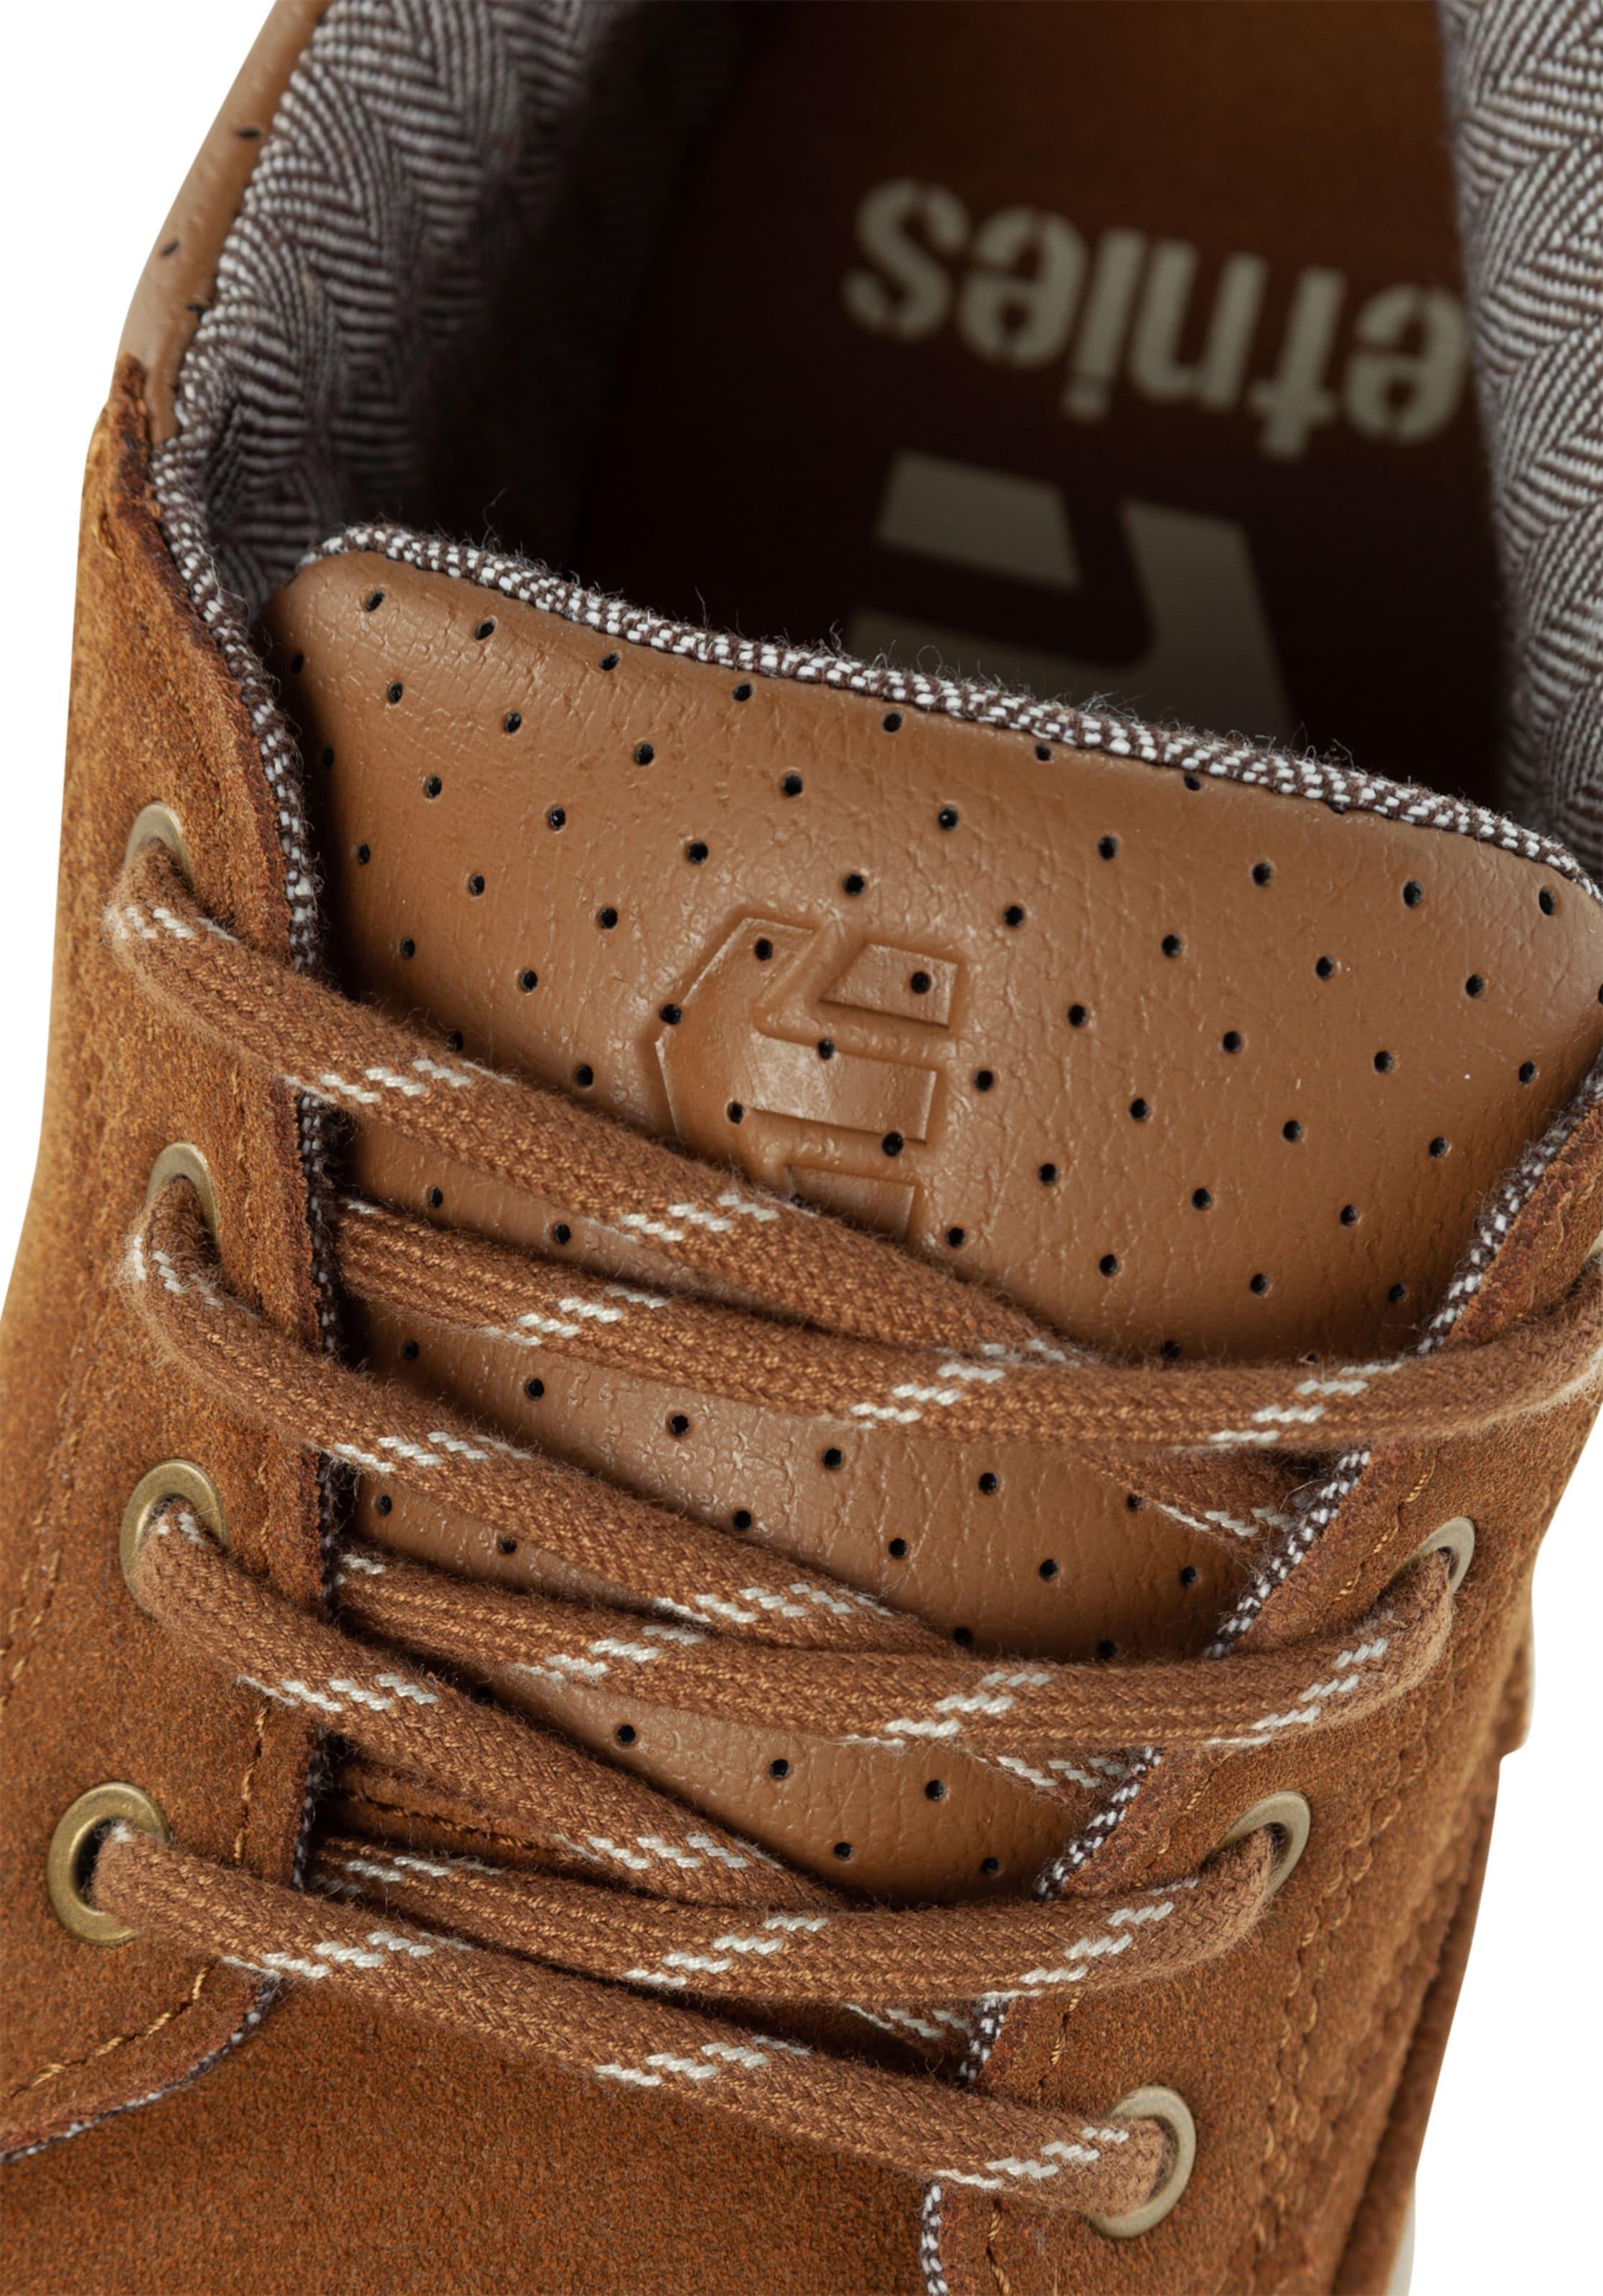 'macallan' 'macallan' In Sneaker BeigeBraun Sneaker Etnies BeigeBraun Etnies In Sneaker 'macallan' Etnies FJTlK1c